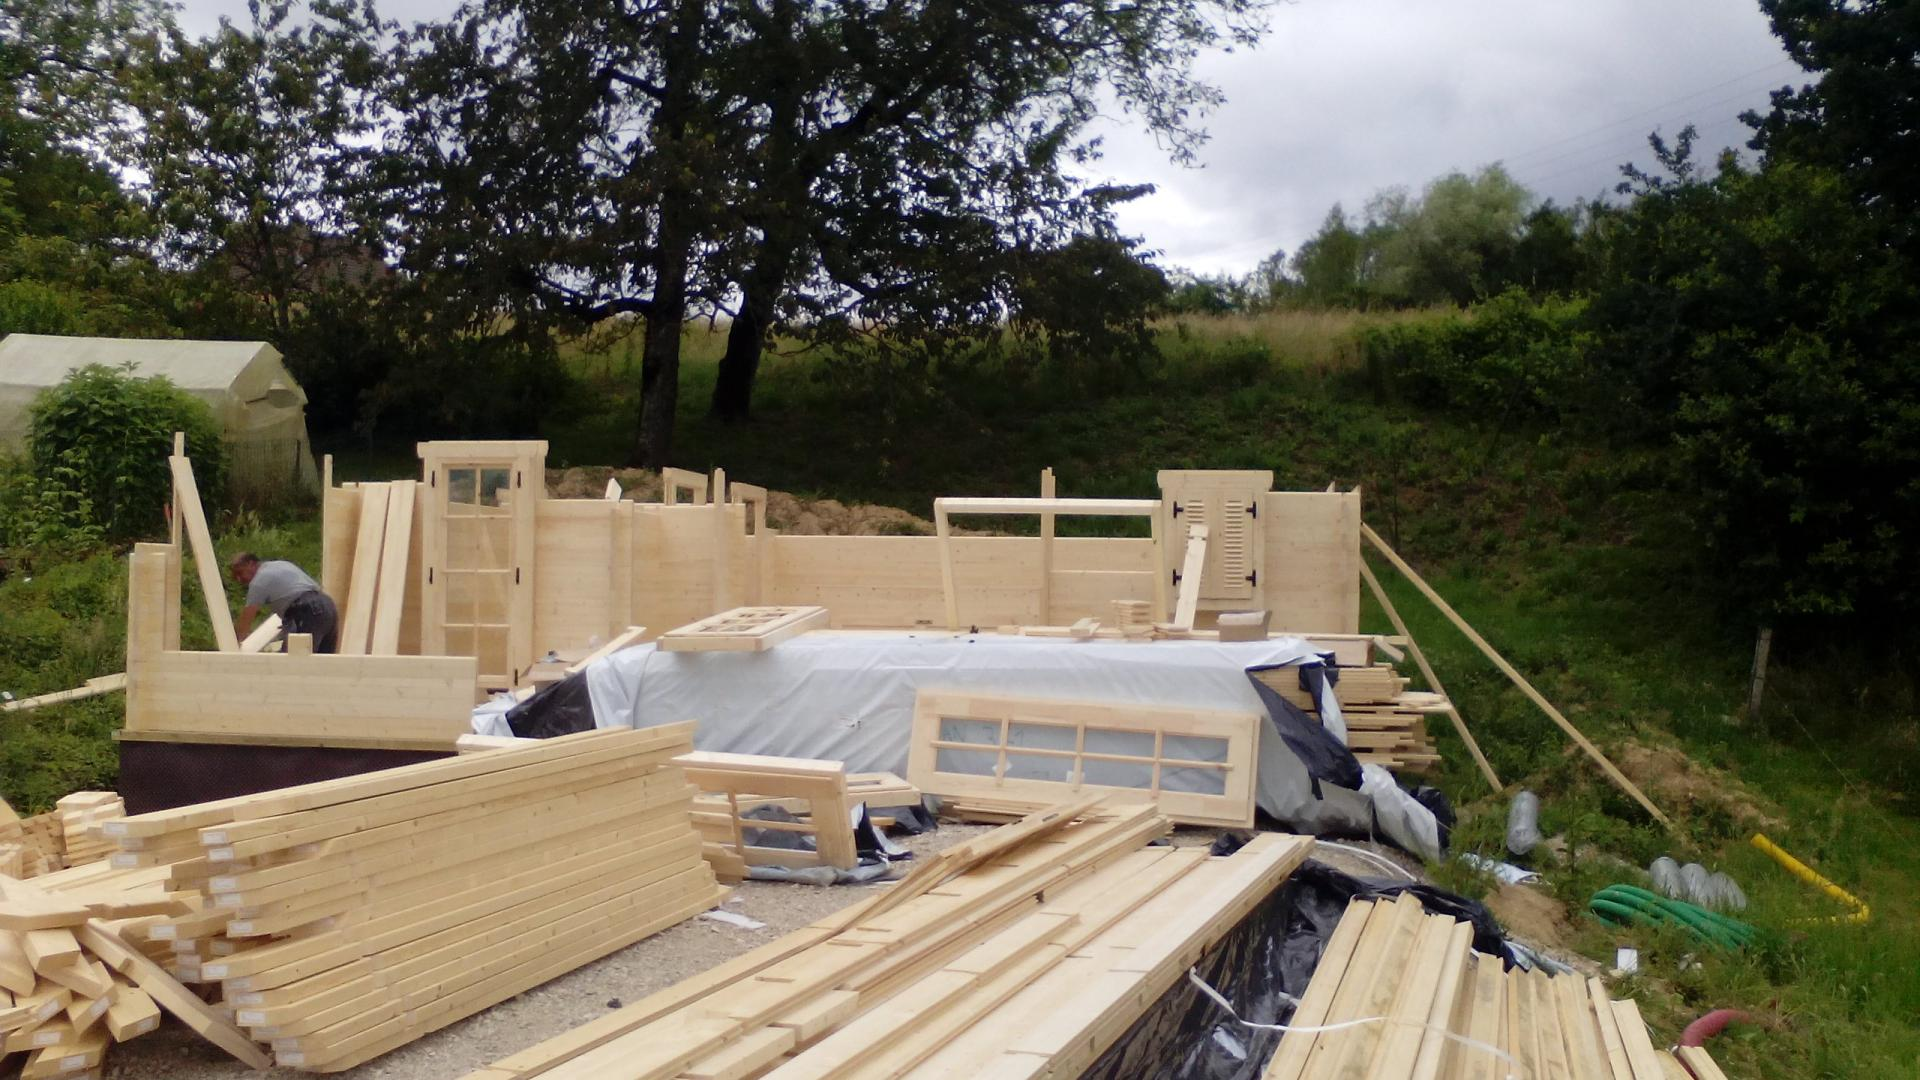 montage chalet en bois mod le ch ne stmb construction. Black Bedroom Furniture Sets. Home Design Ideas